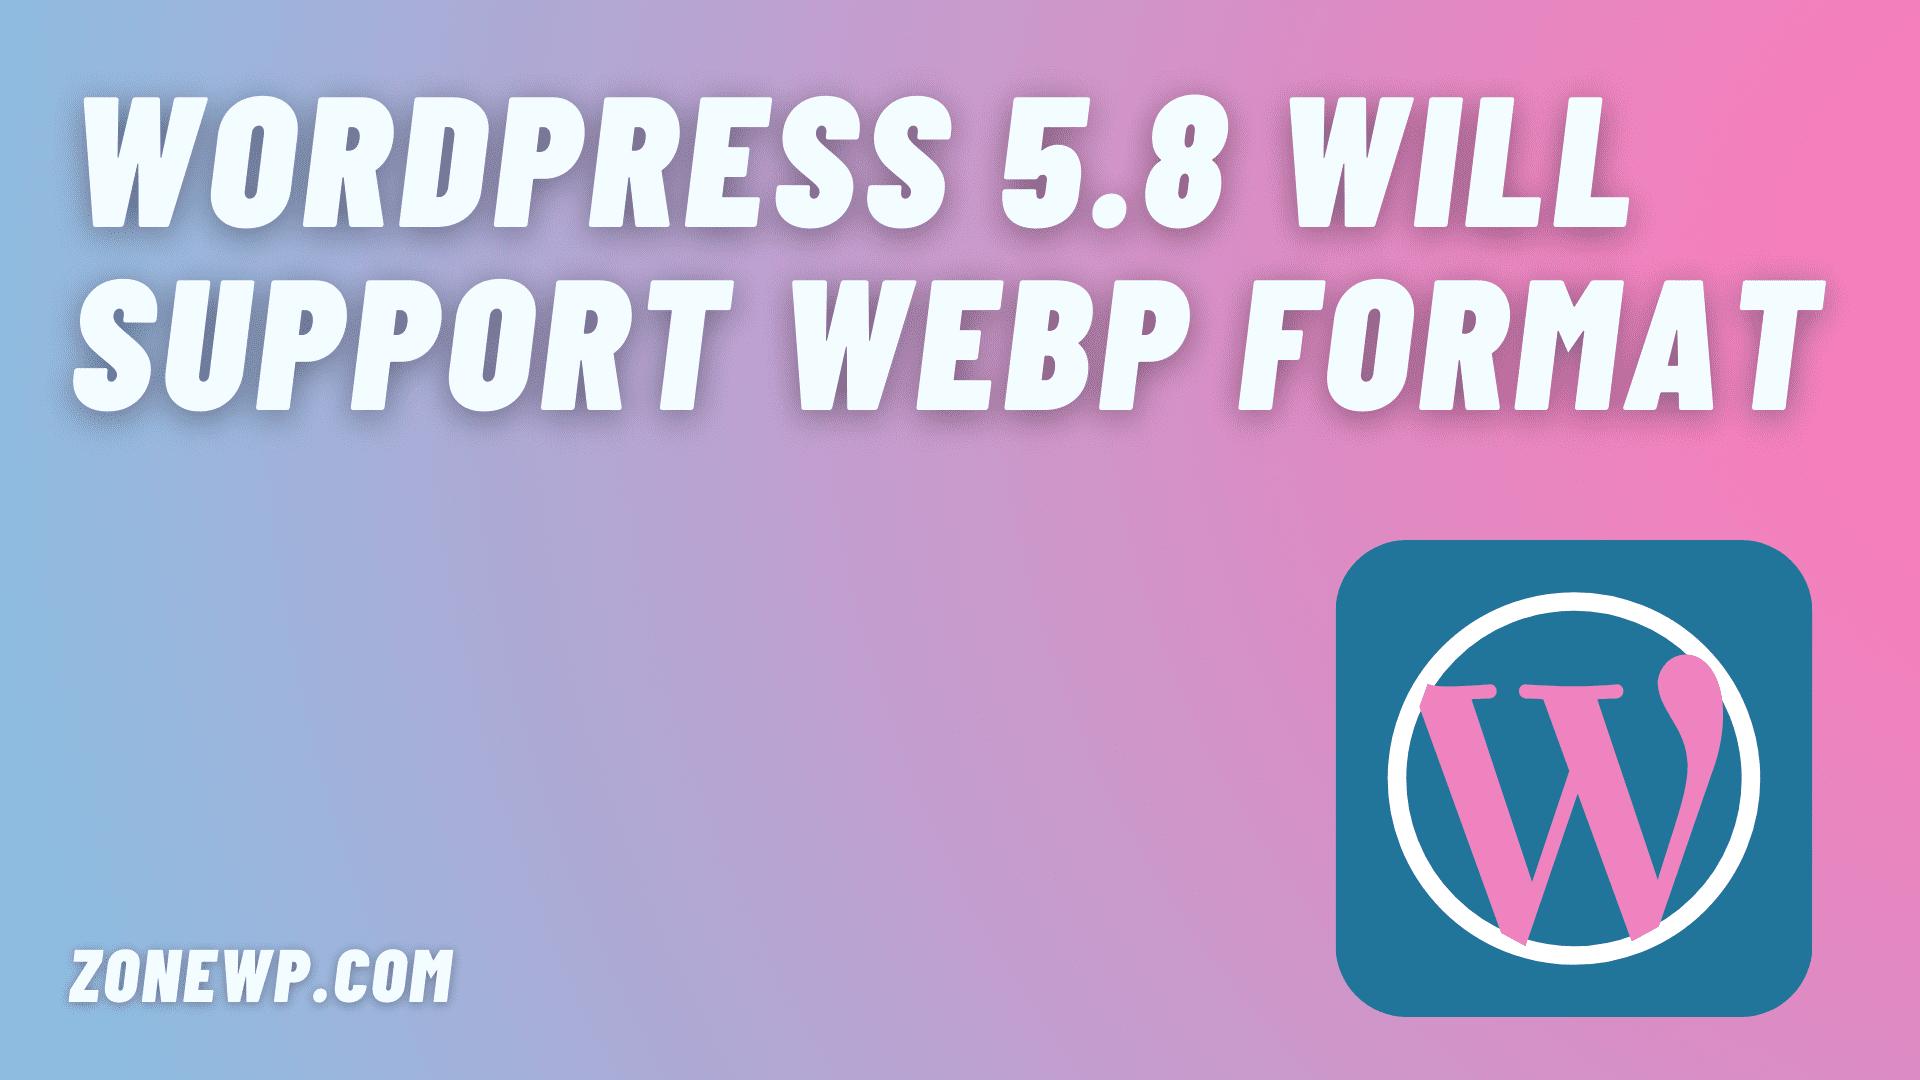 WordPress 5.8 will Support WebP Image Format